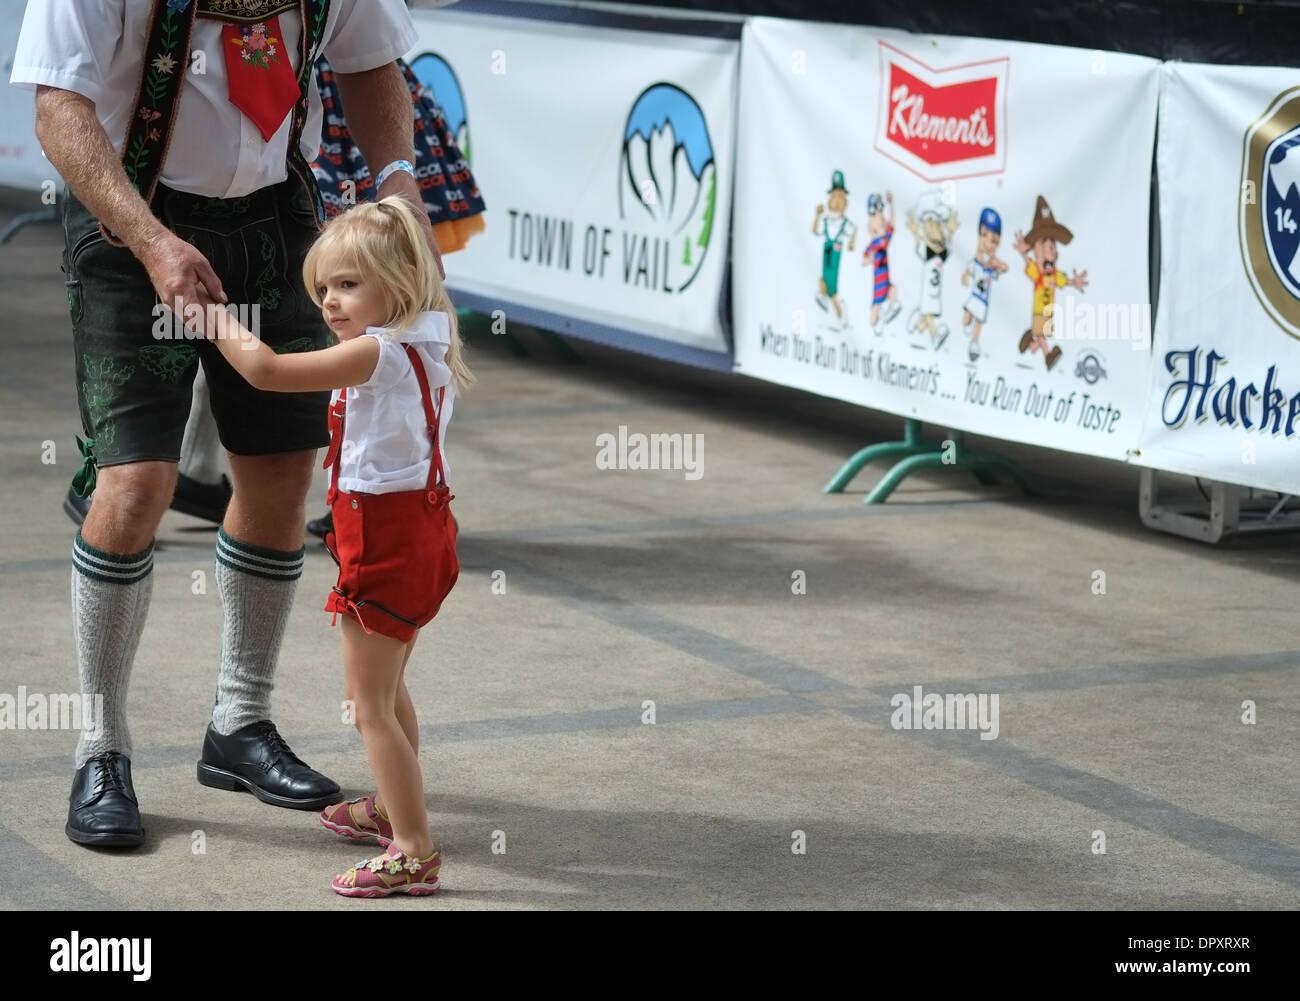 Girl dancing with man in lederhosen at Oktoberfest - Stock Image